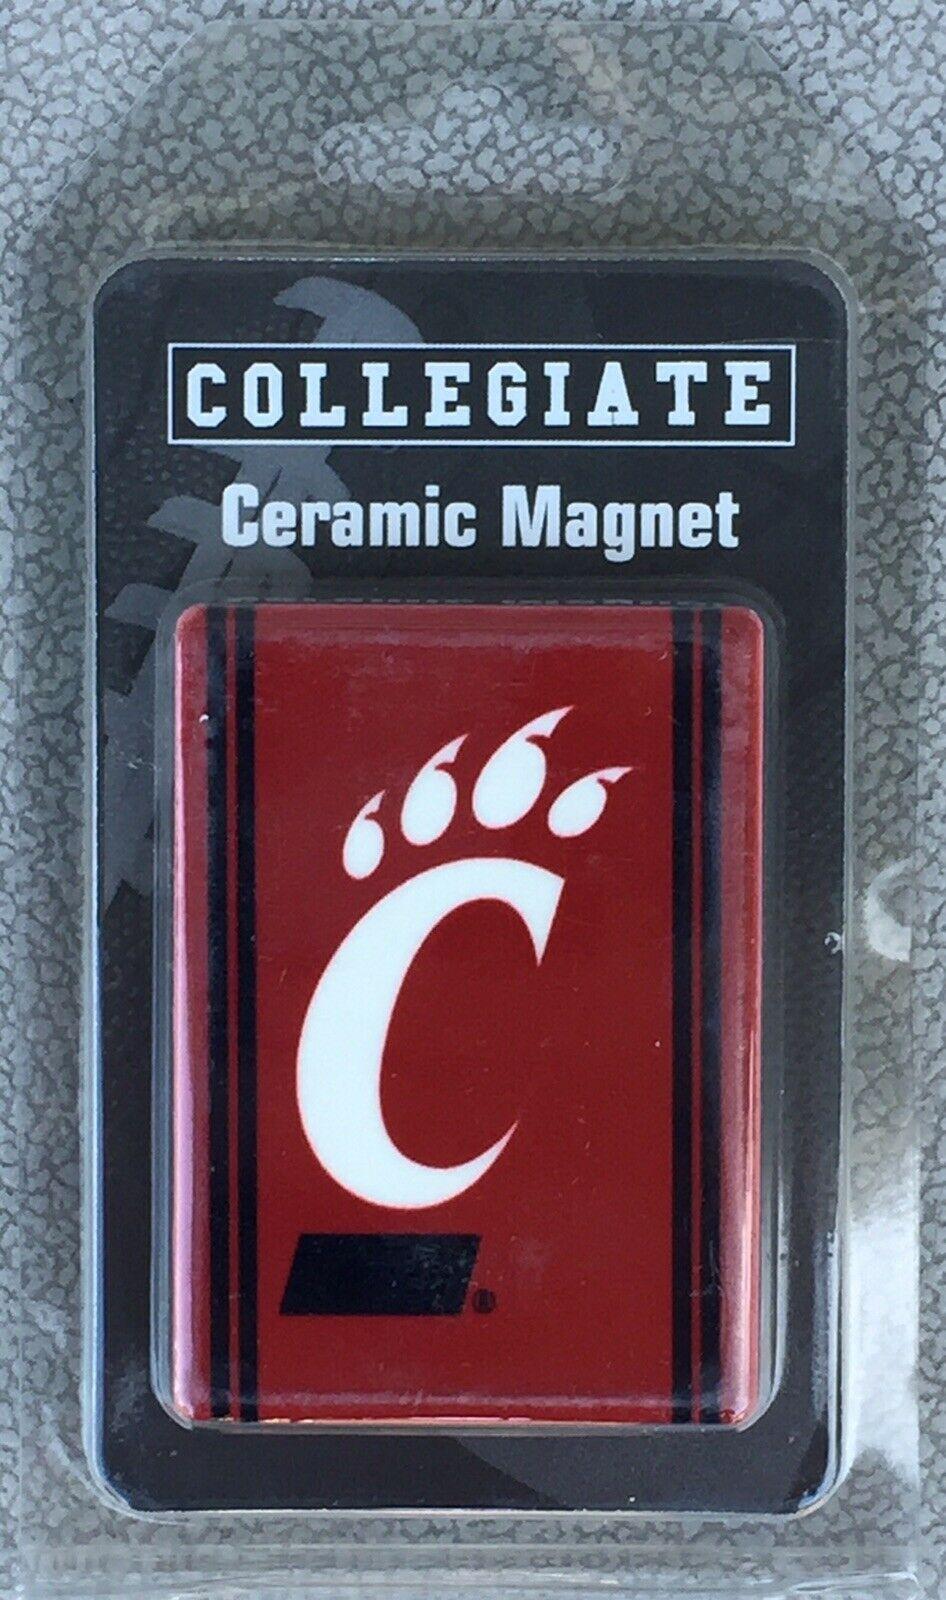 Cincinnati Bearcats Red NCAA Collegiate Ceramic Refrigerator Magnet - New - $6.96